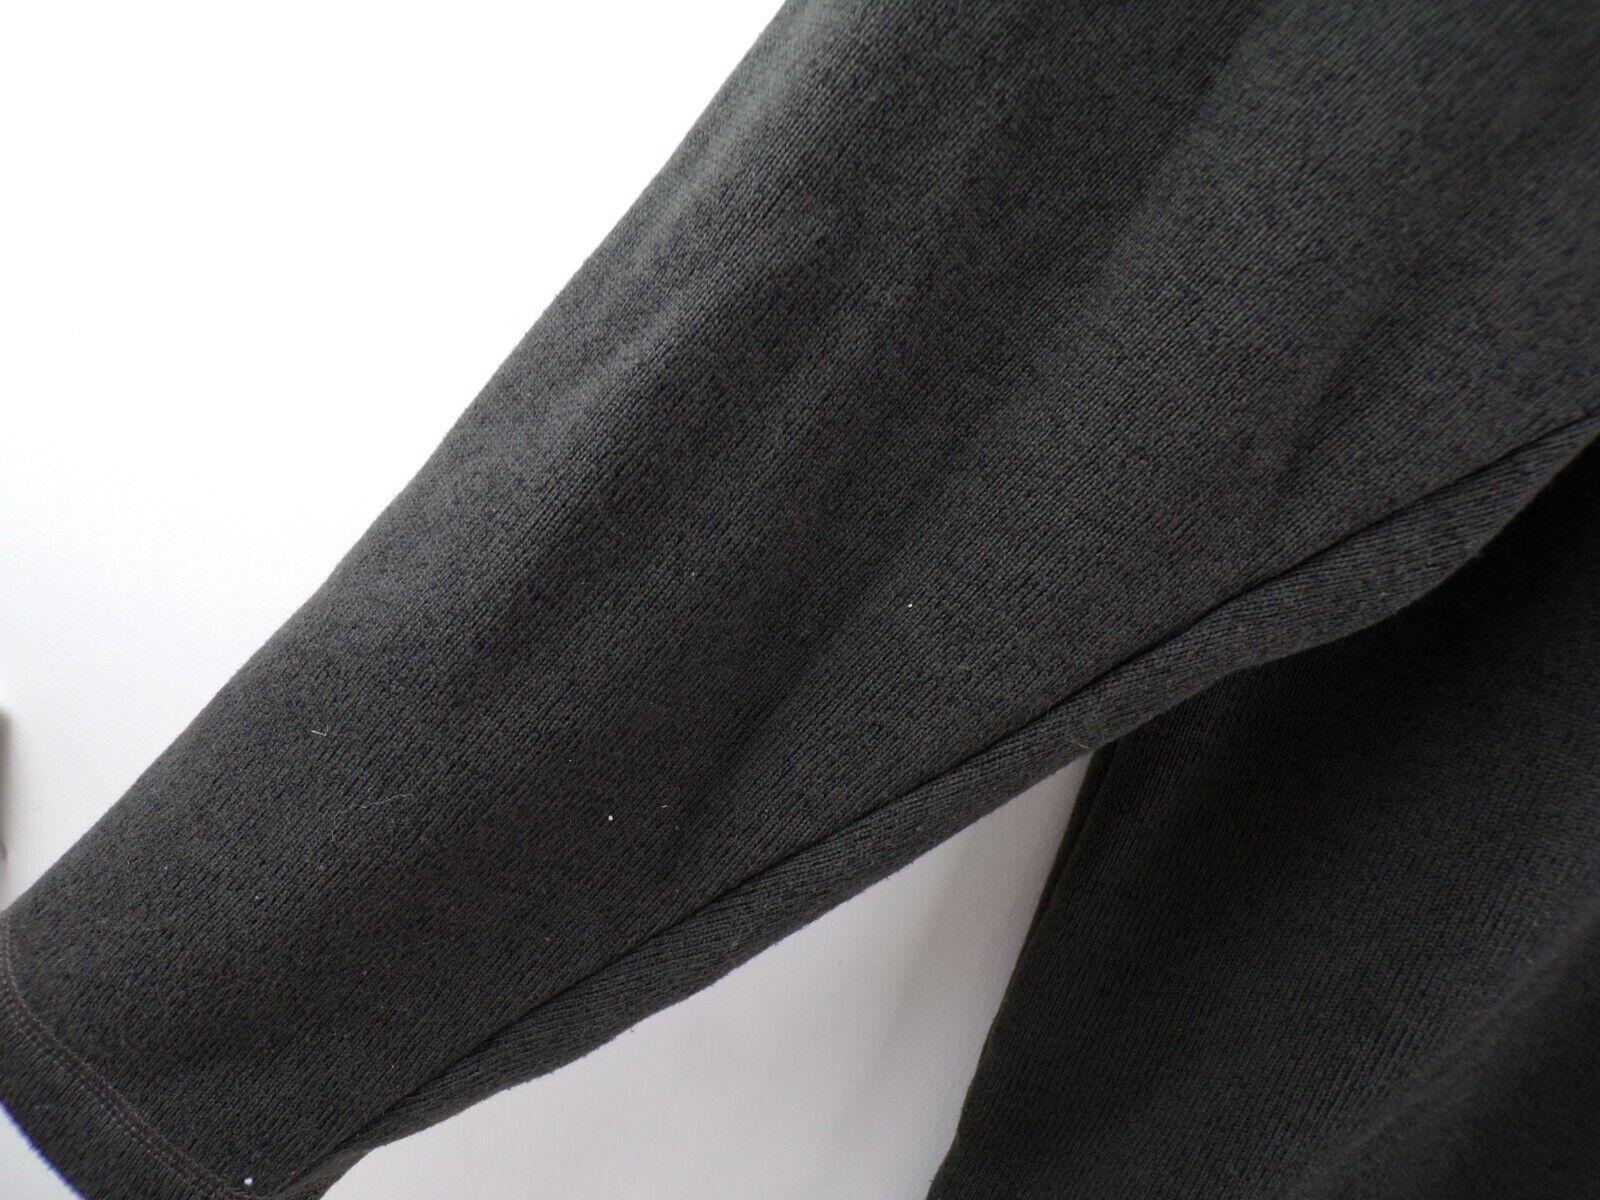 1990s VINTAGE Van Heusen 4 inch blade Dark plum with silver gray zebra stripes in a diagonal pattern